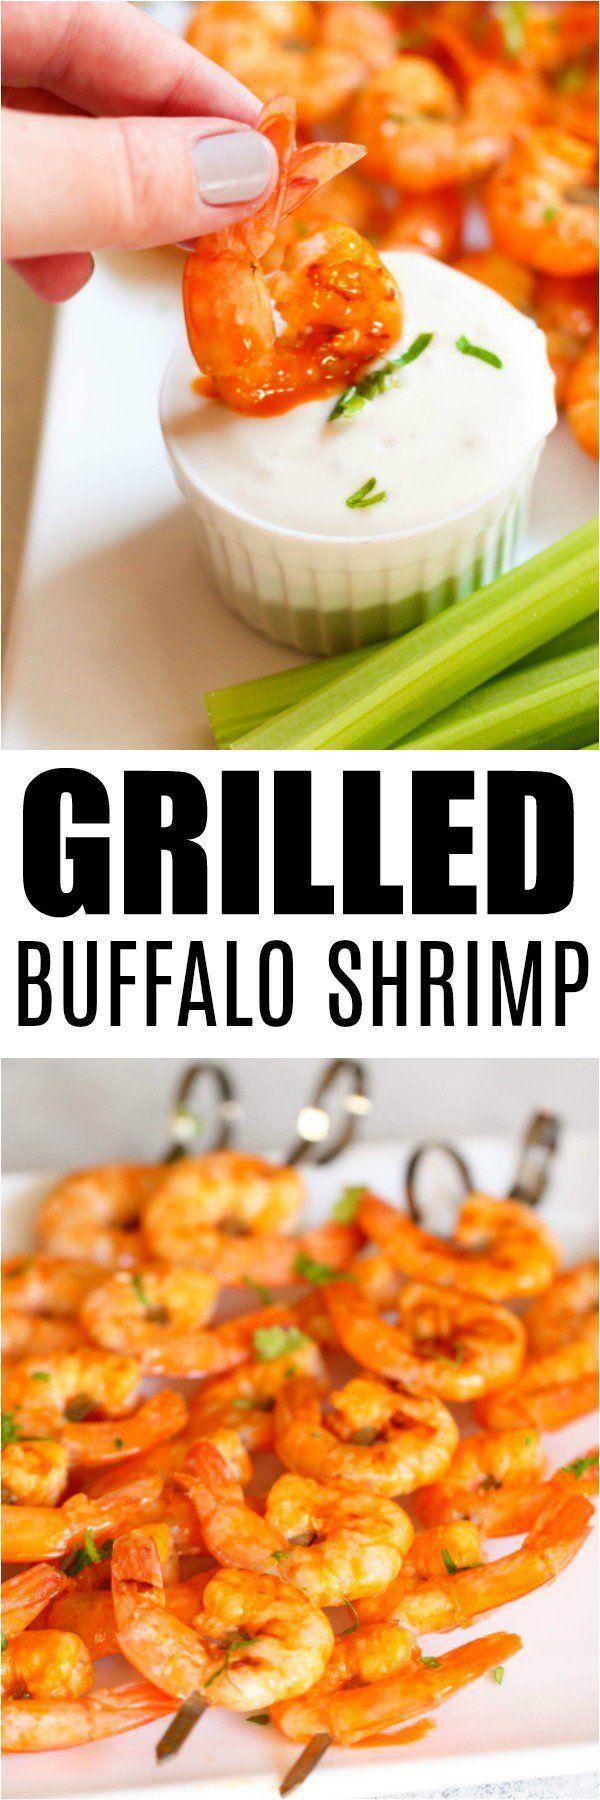 Grilled Buffalo Shrimp #buffaloshrimp